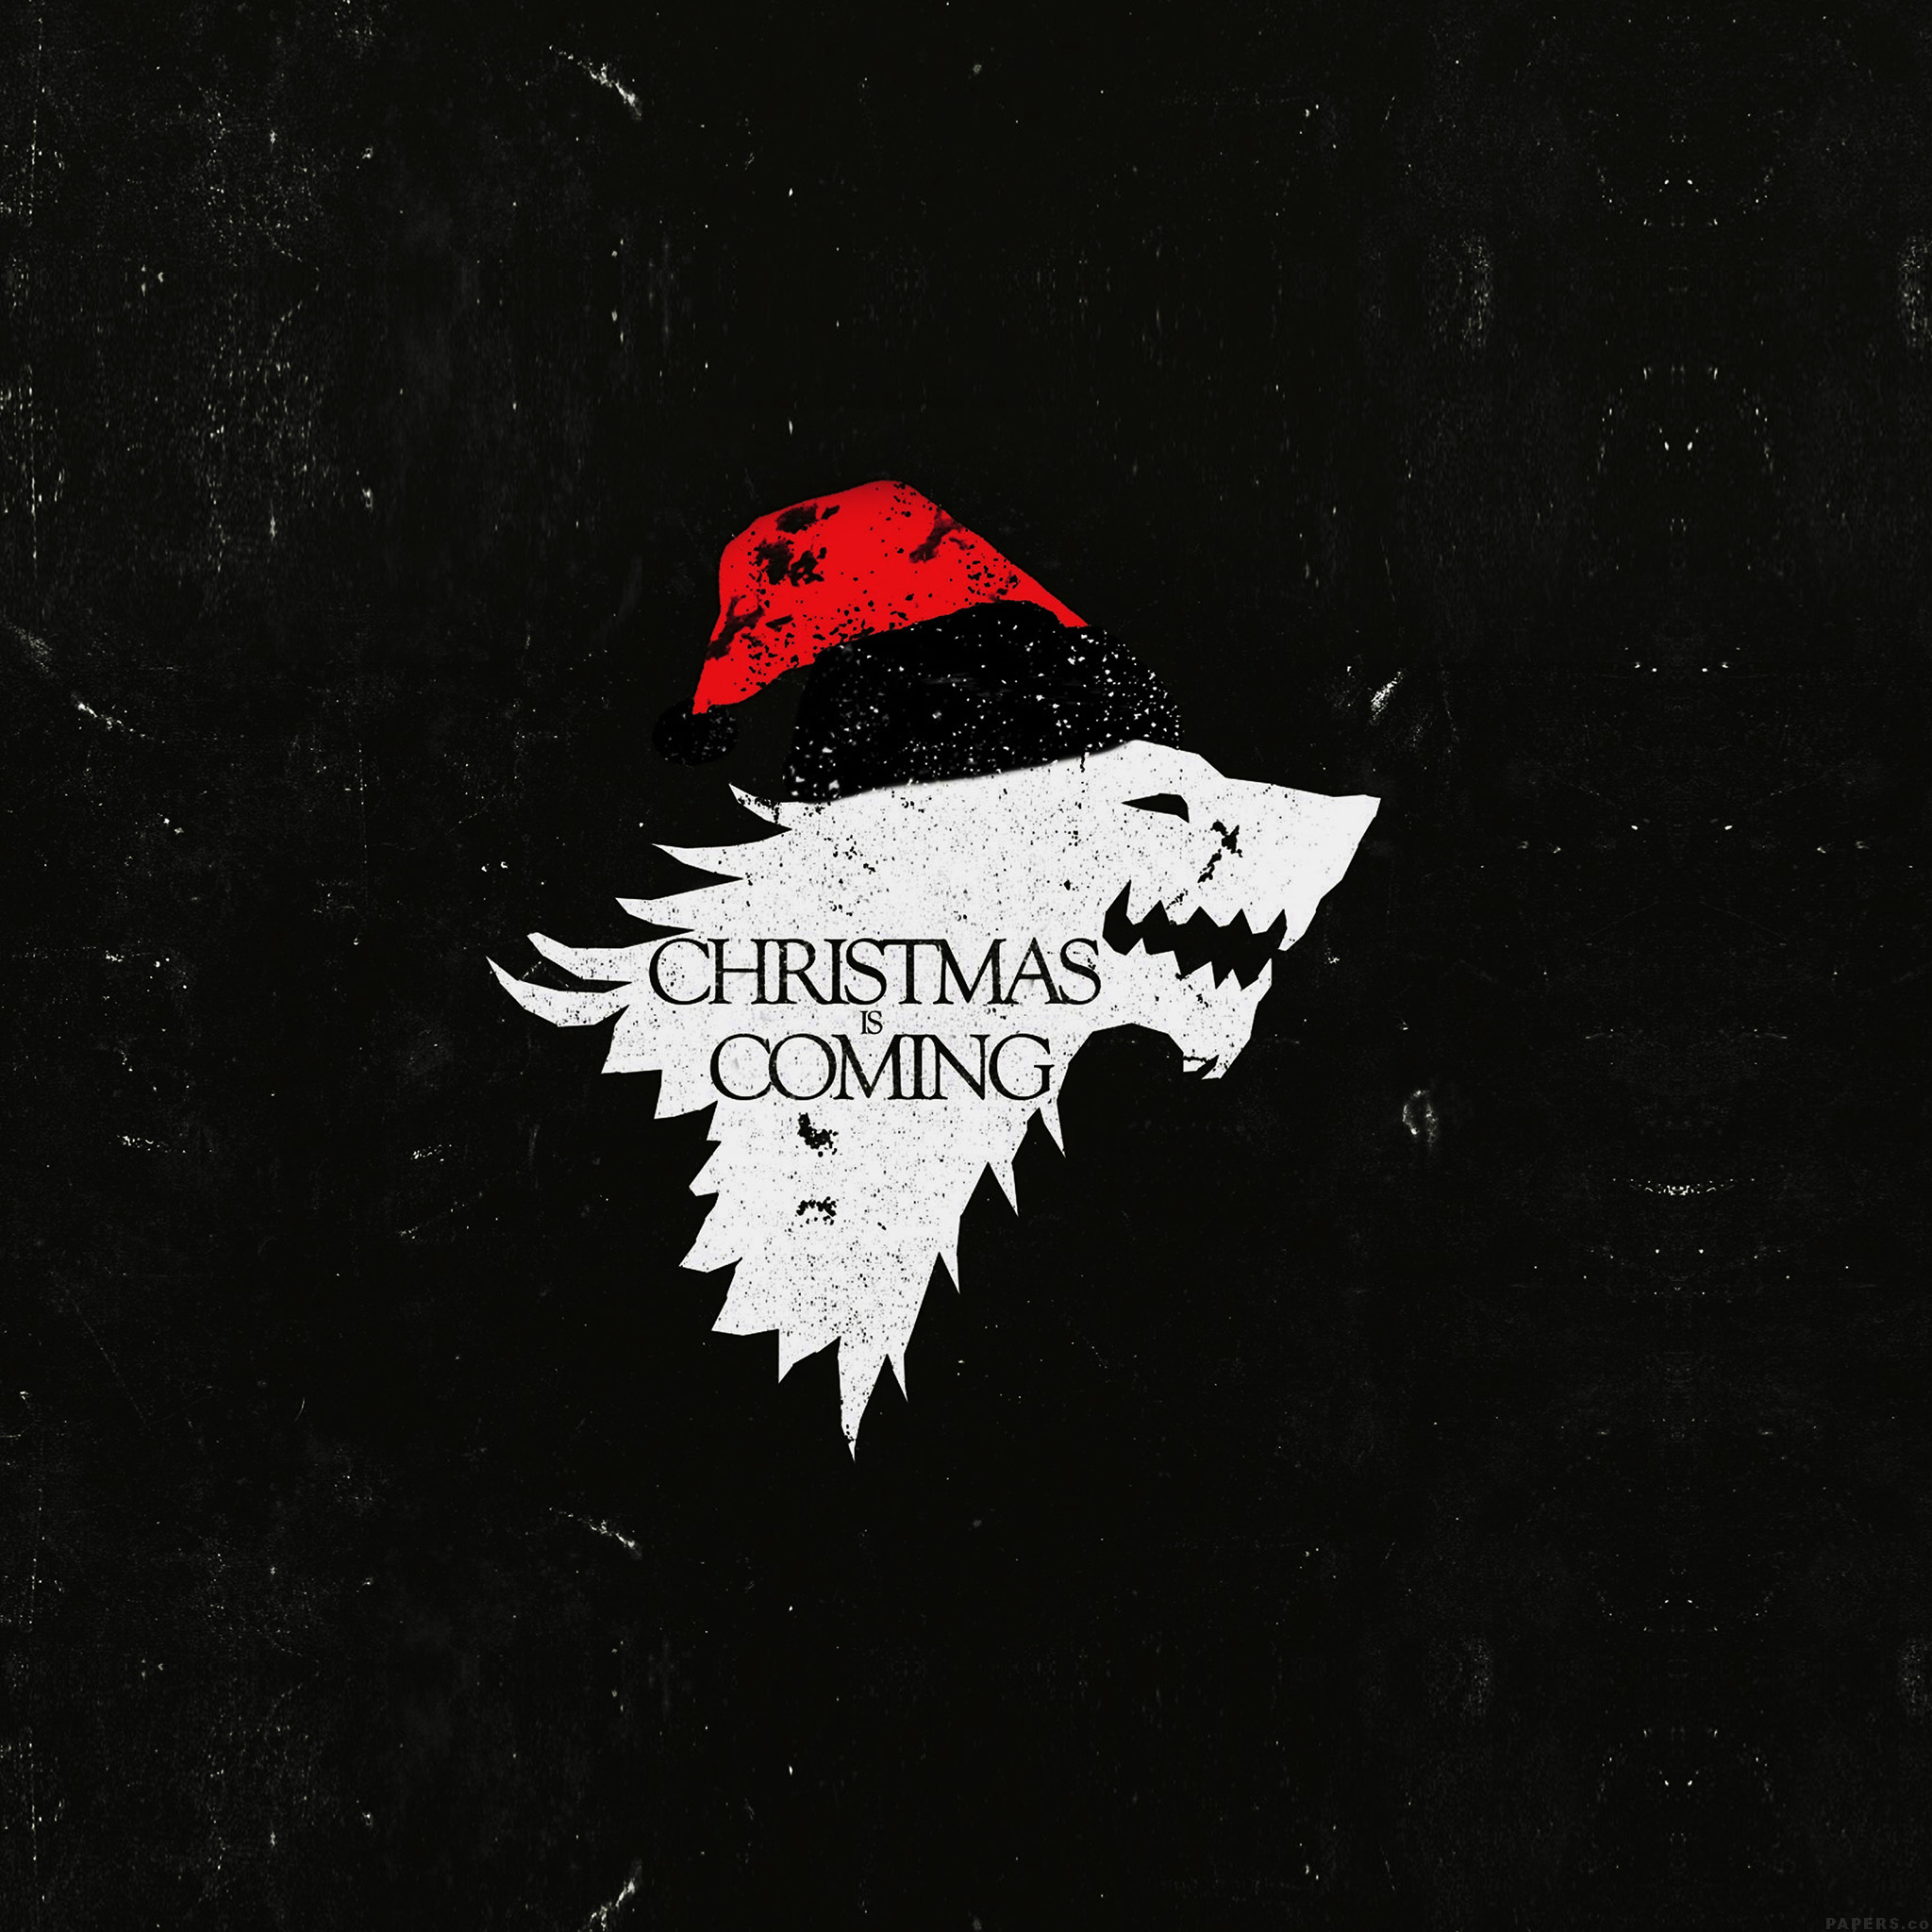 Ag24-christmas-is-coming-dark-game-of-thrones-art-wallpaper